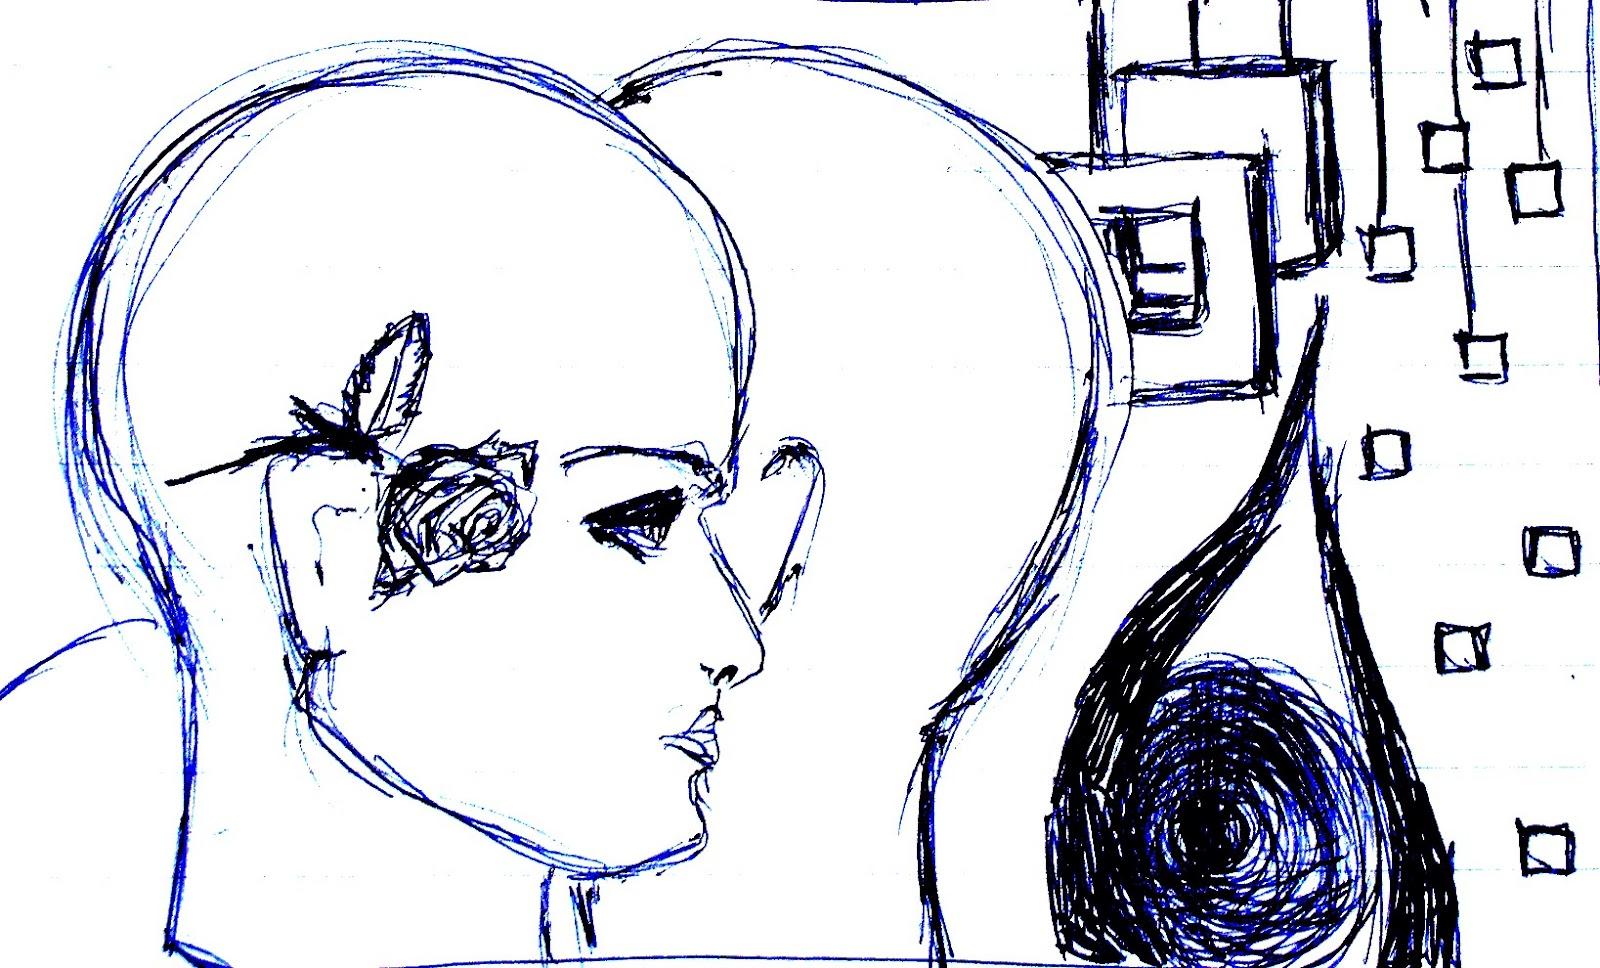 http://4.bp.blogspot.com/-n2idKsDq16k/T6RSpYlBHzI/AAAAAAAAPms/dl8m4GoO8KY/s1600/rosinha.jpg